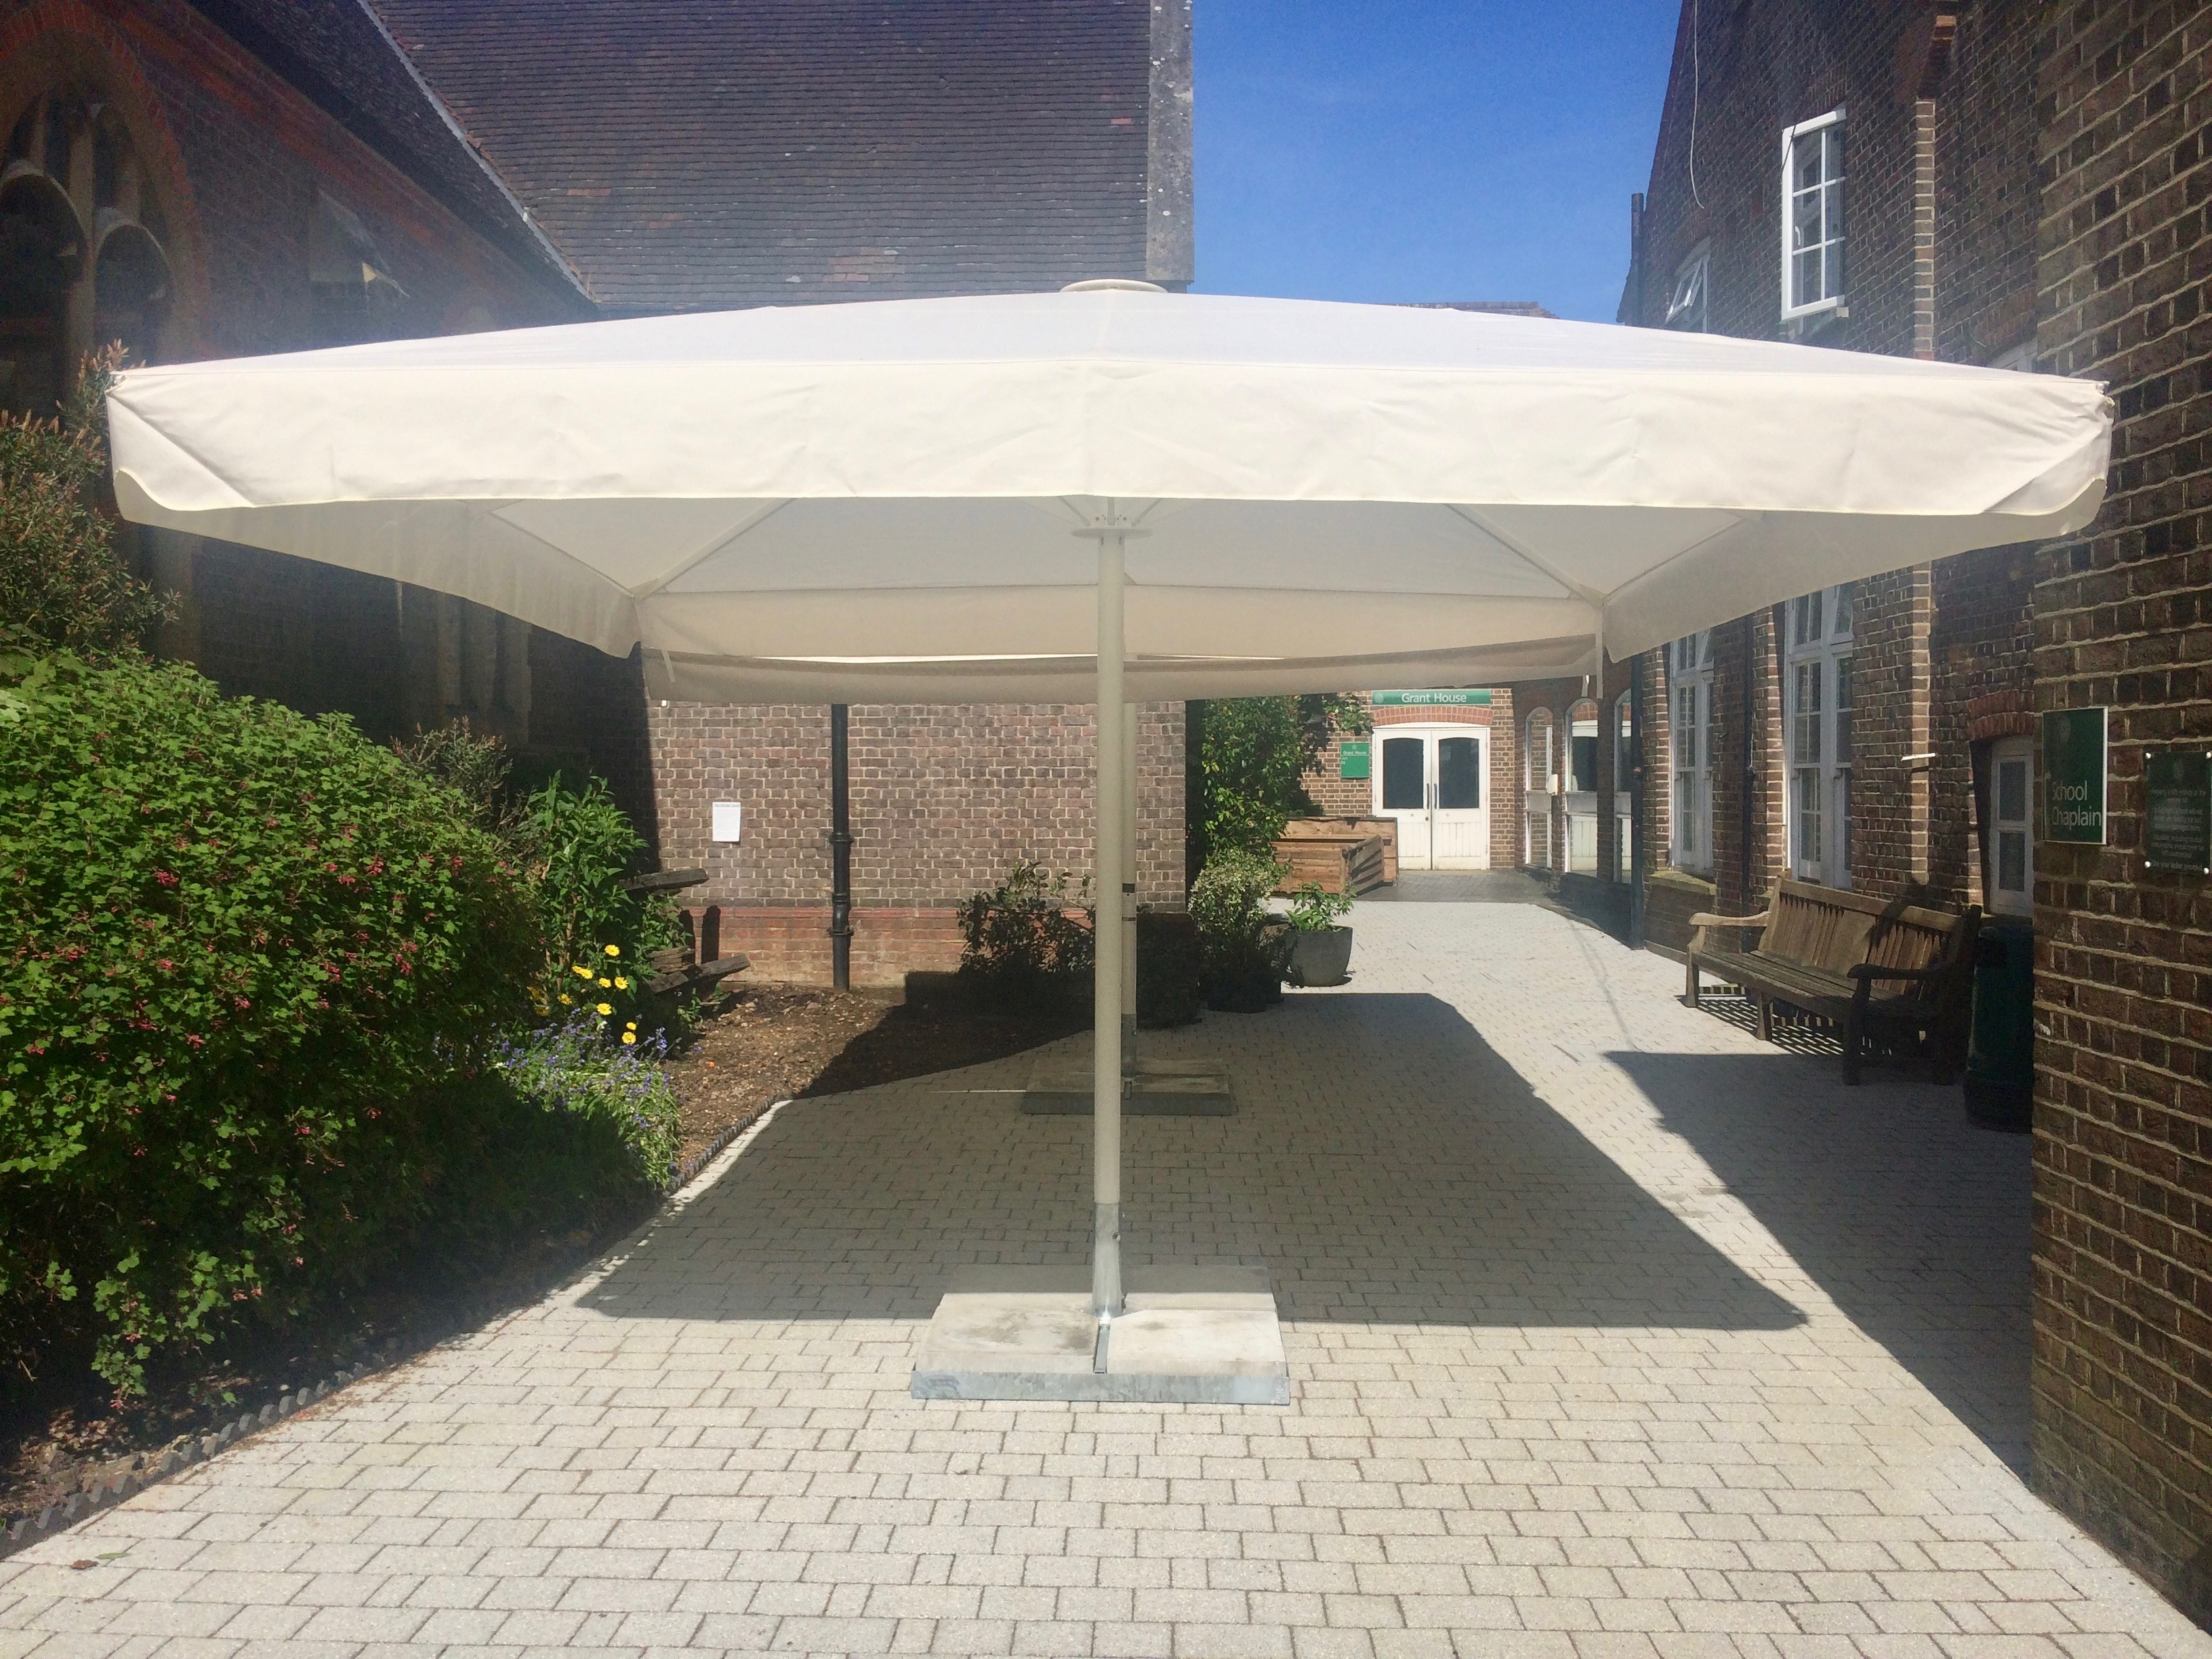 Big Umbrellas In Hertfordshire